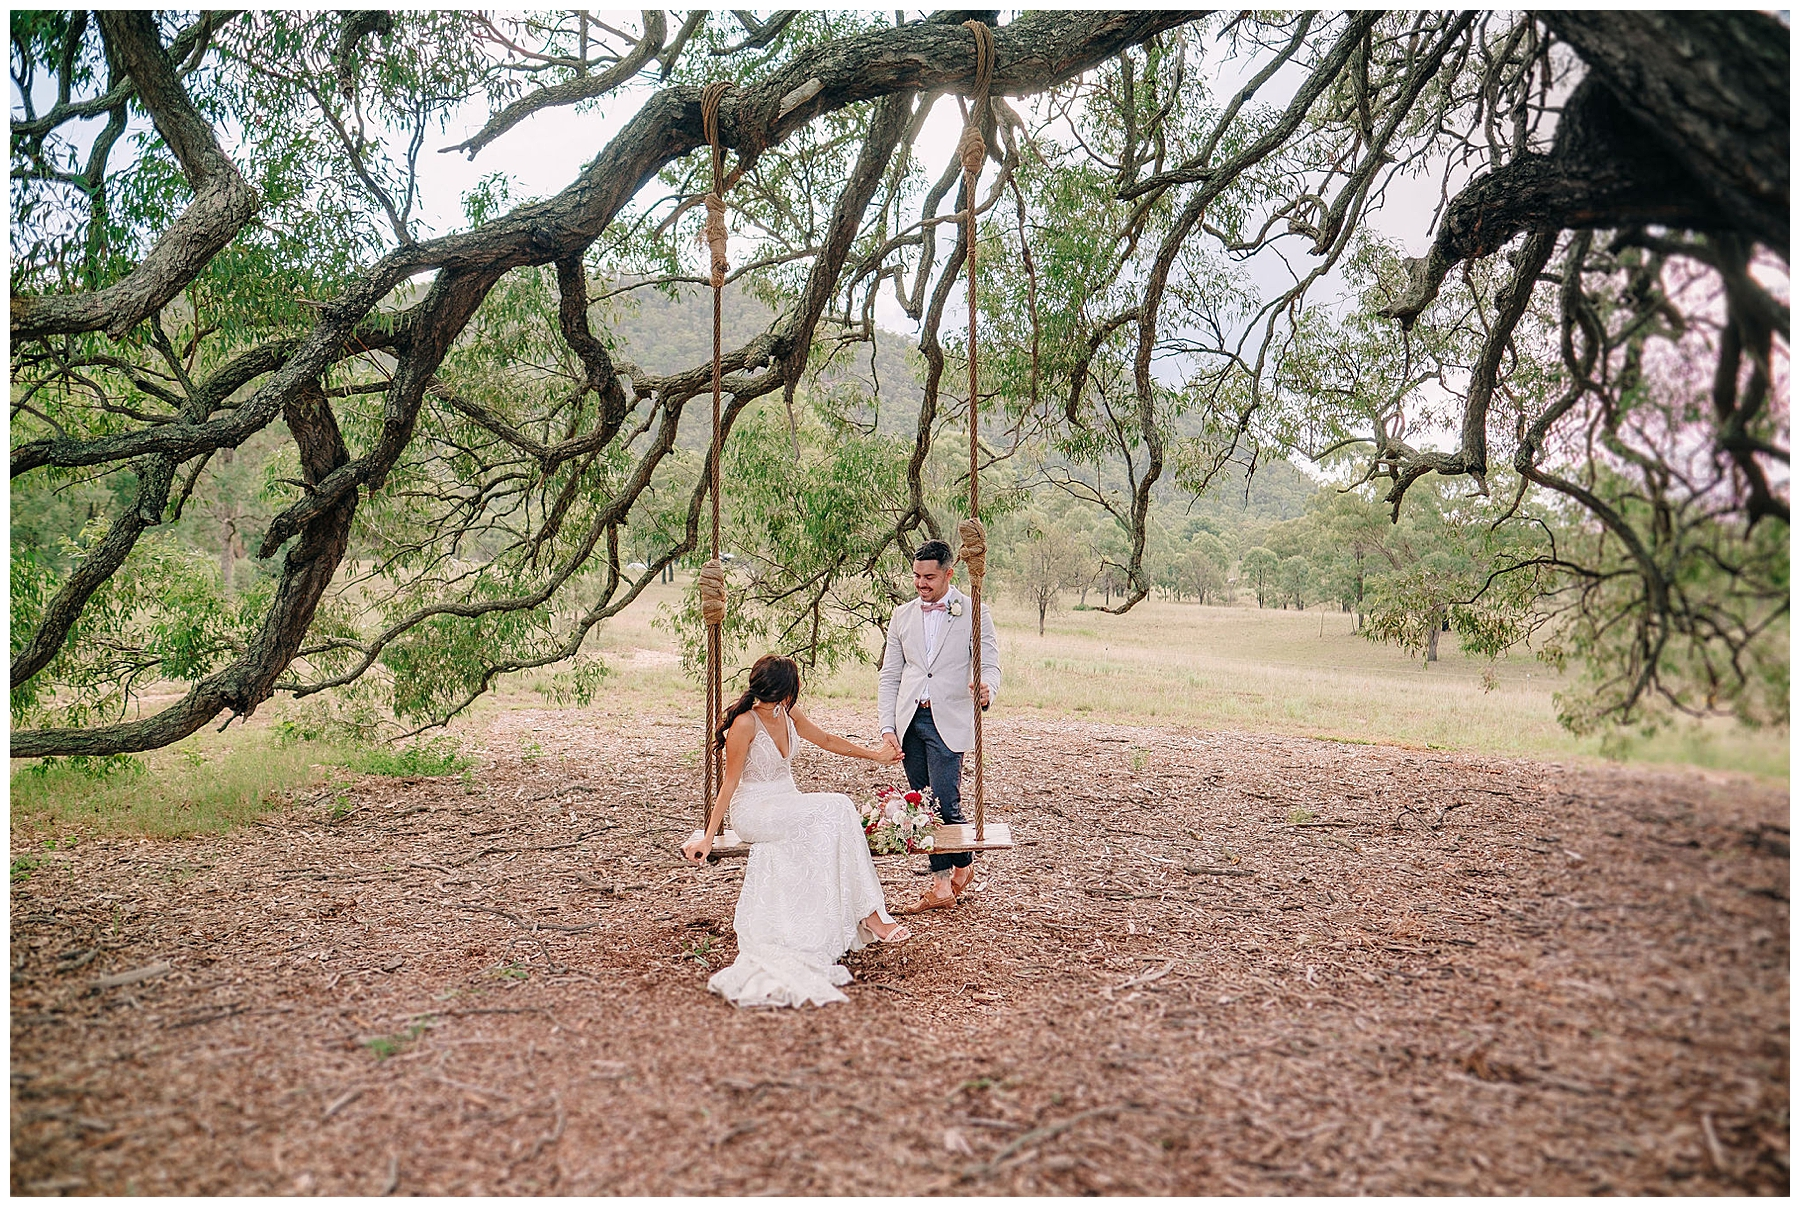 Adam's Peak Wedding Photos + Popcorn Photography_0049.jpg